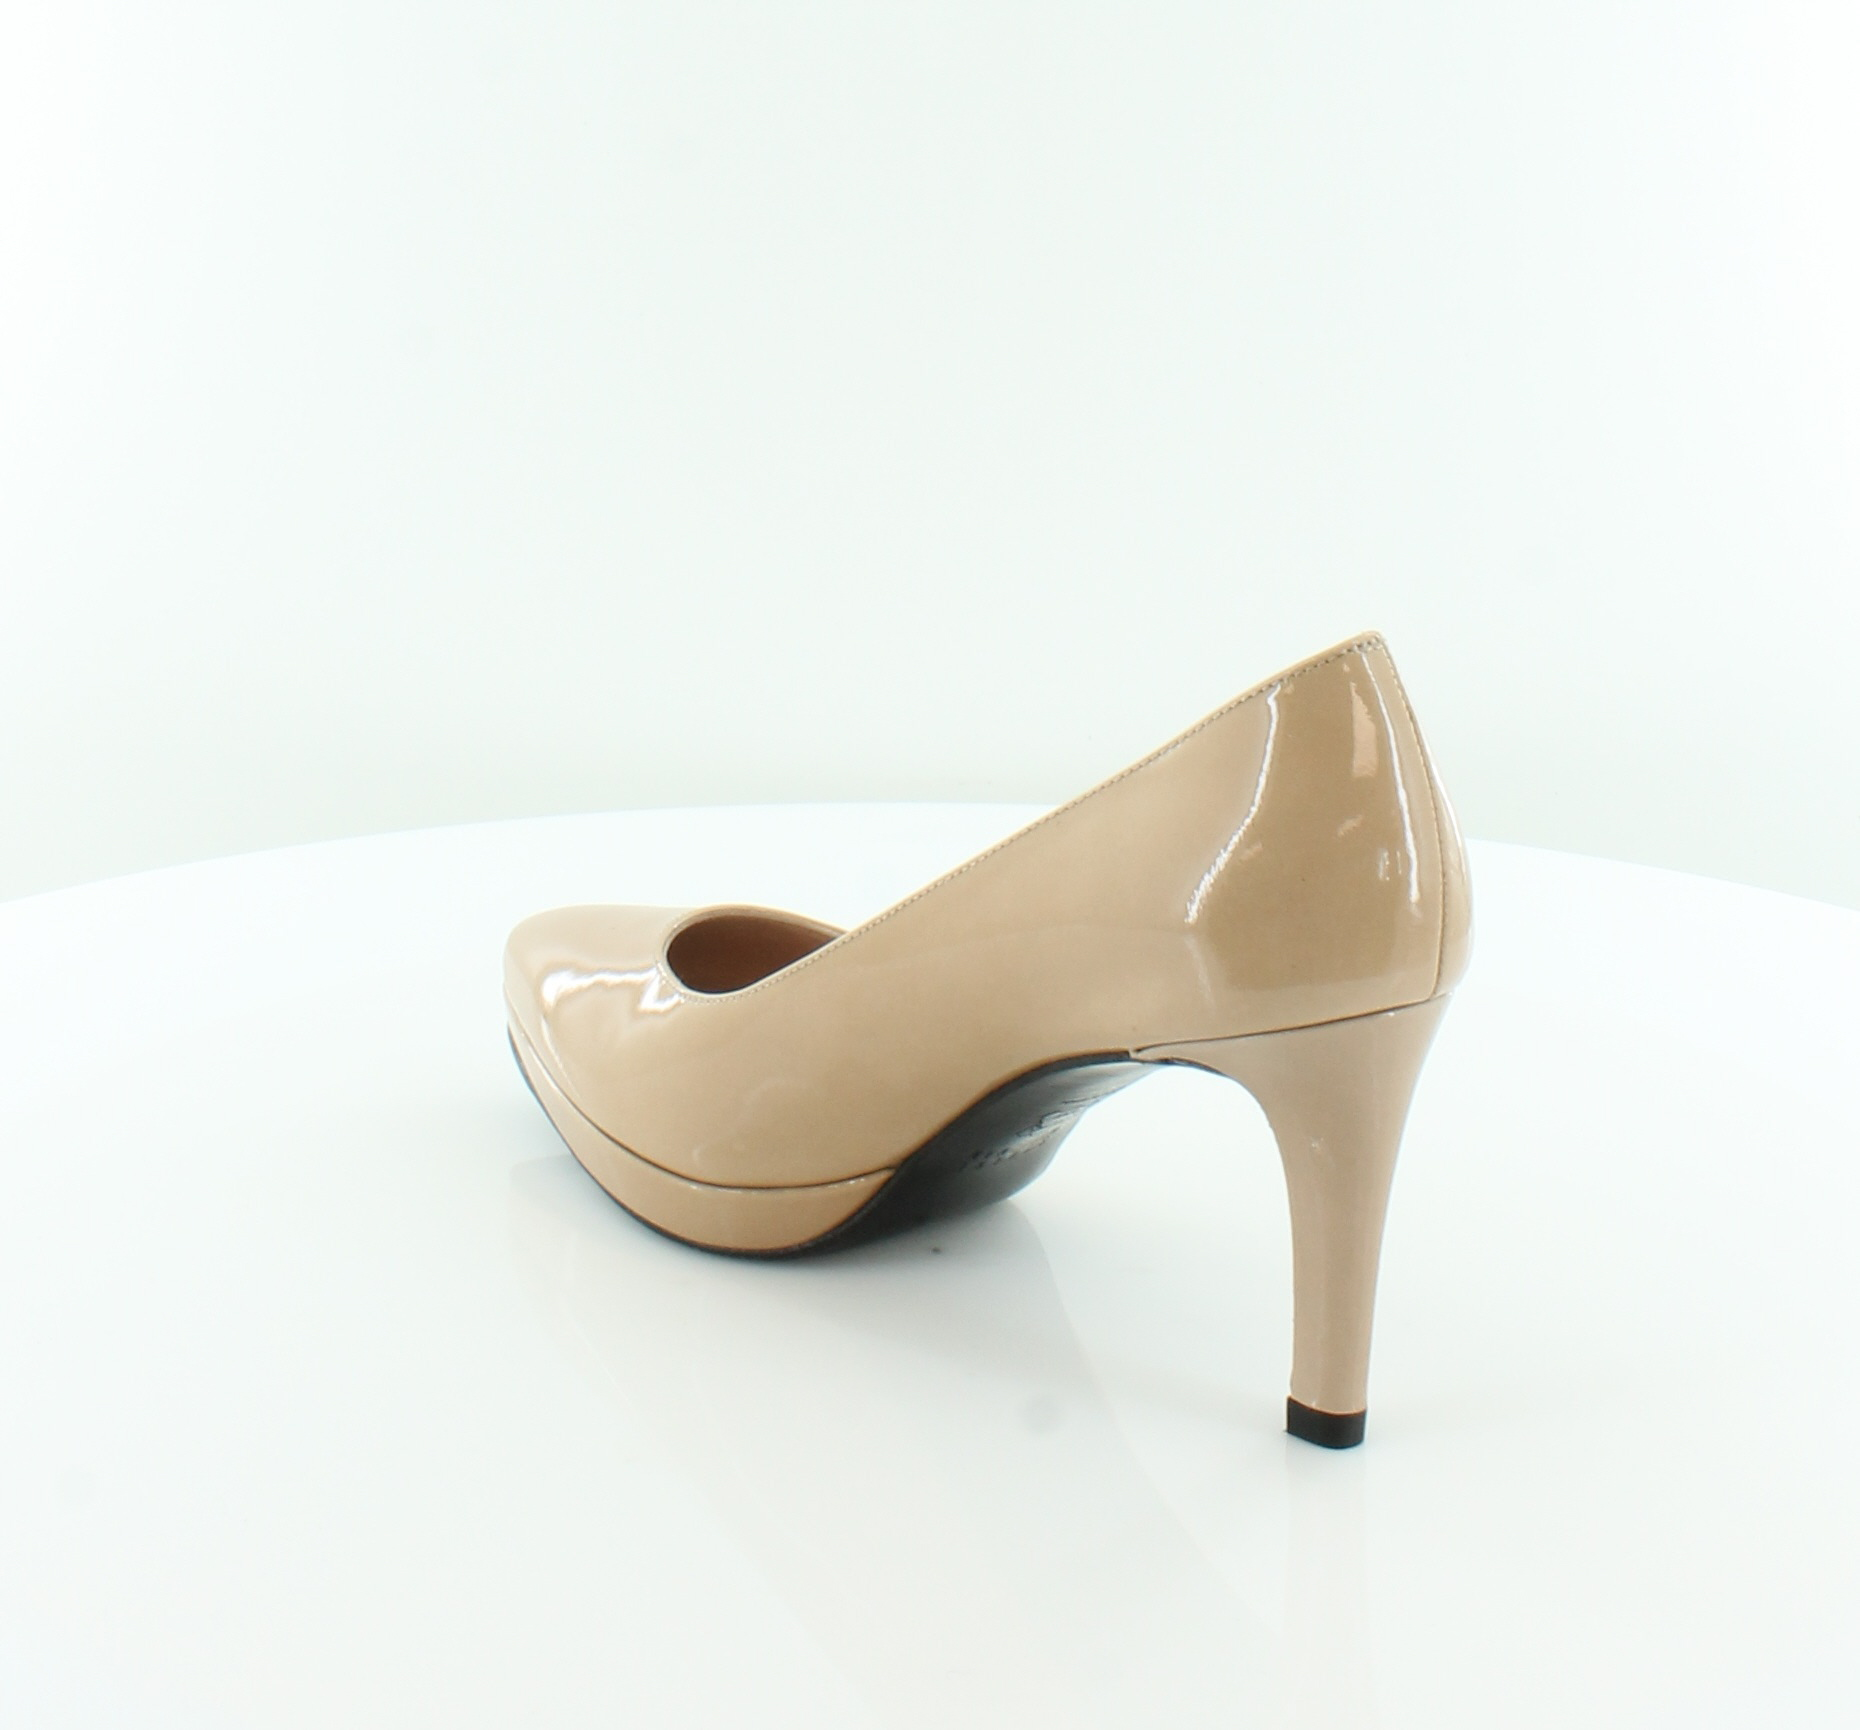 Stuart Weitzman New PLATO Brown Donna Heels Shoes Size 5 M Heels Donna MSRP  398 7c48d7